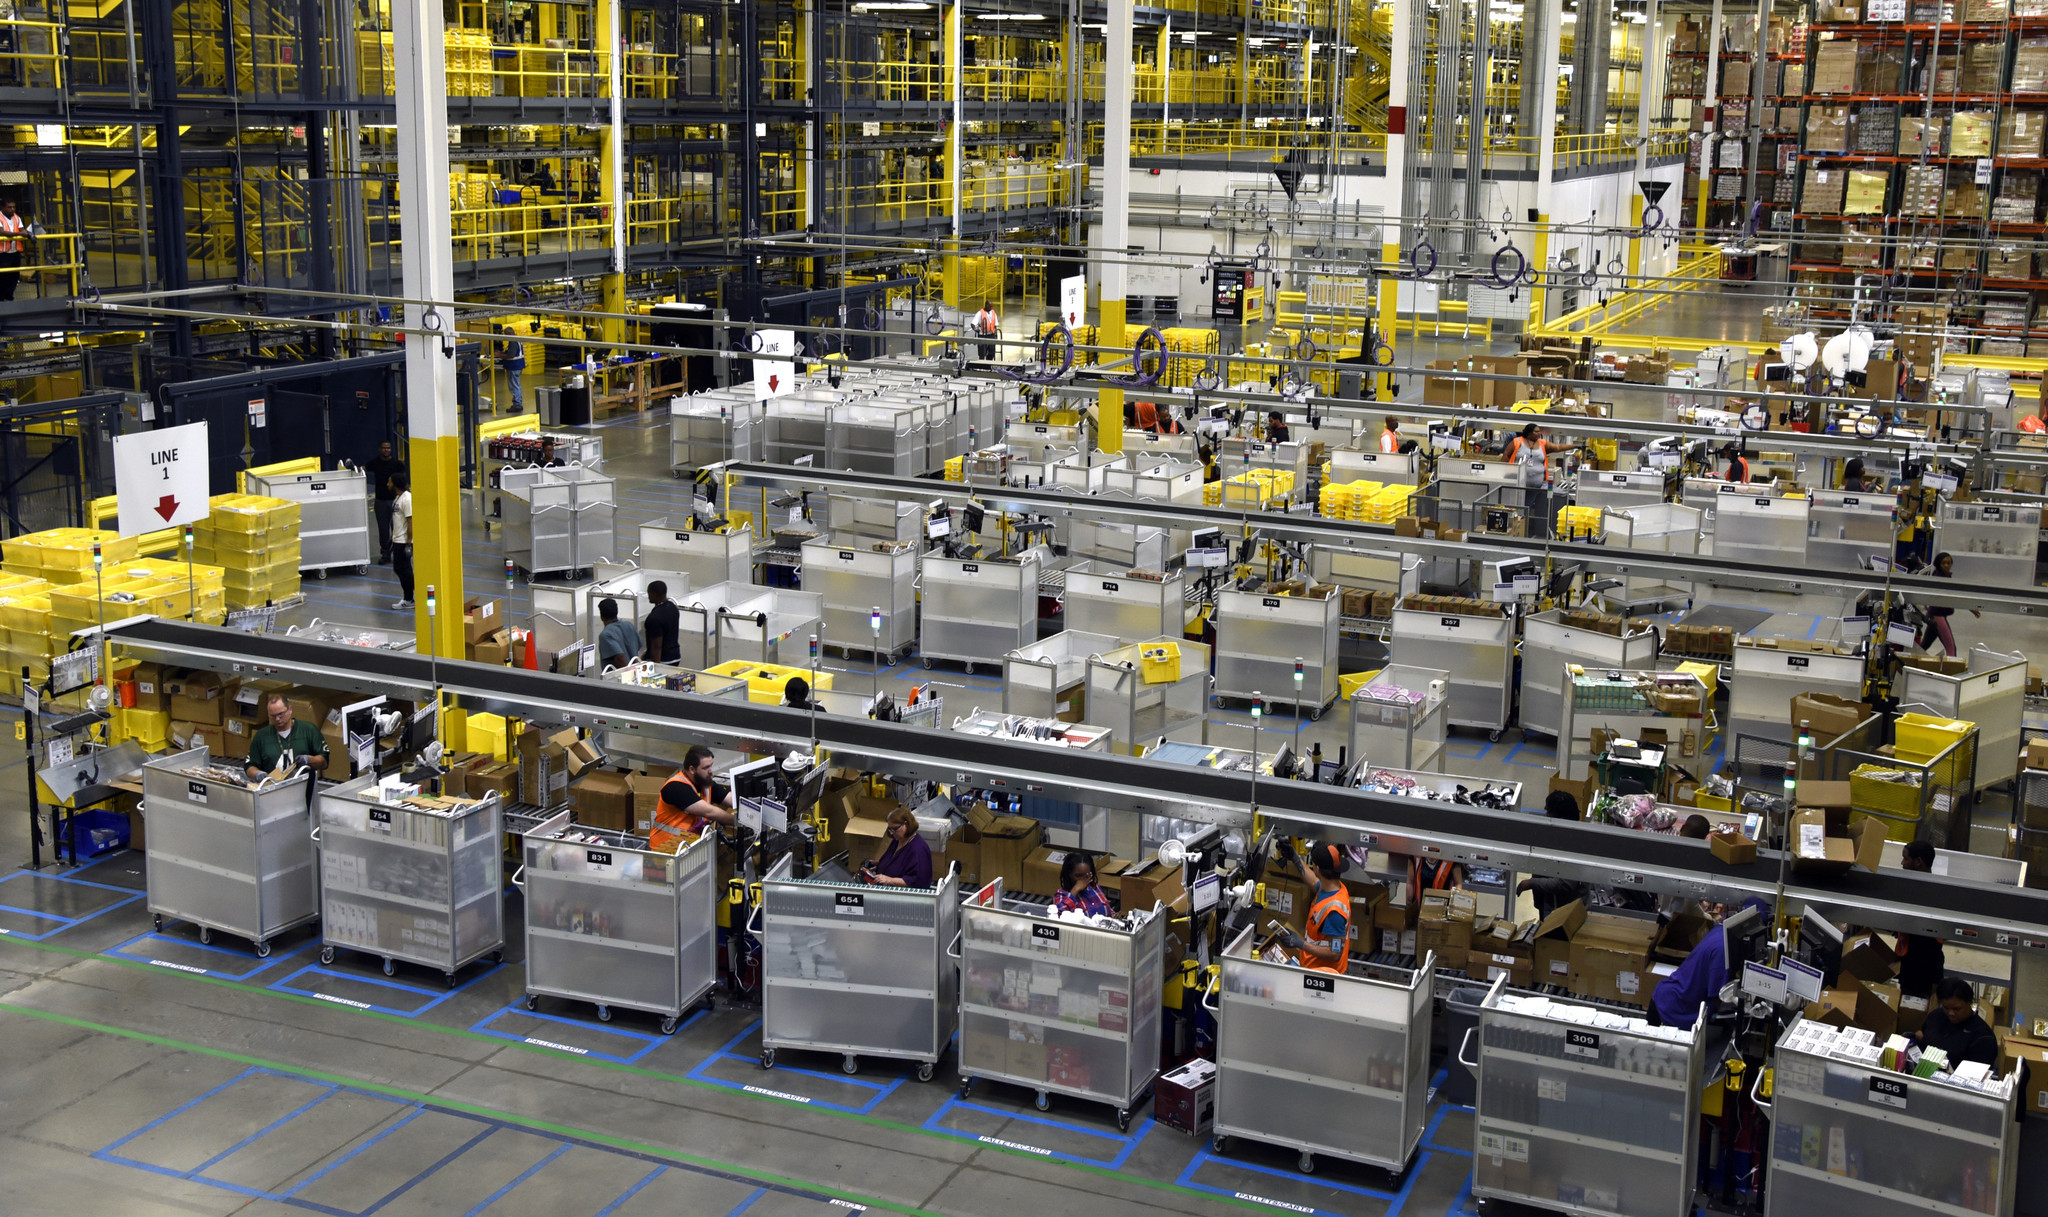 Amazon Showcases Robots At Massive New Warehouse